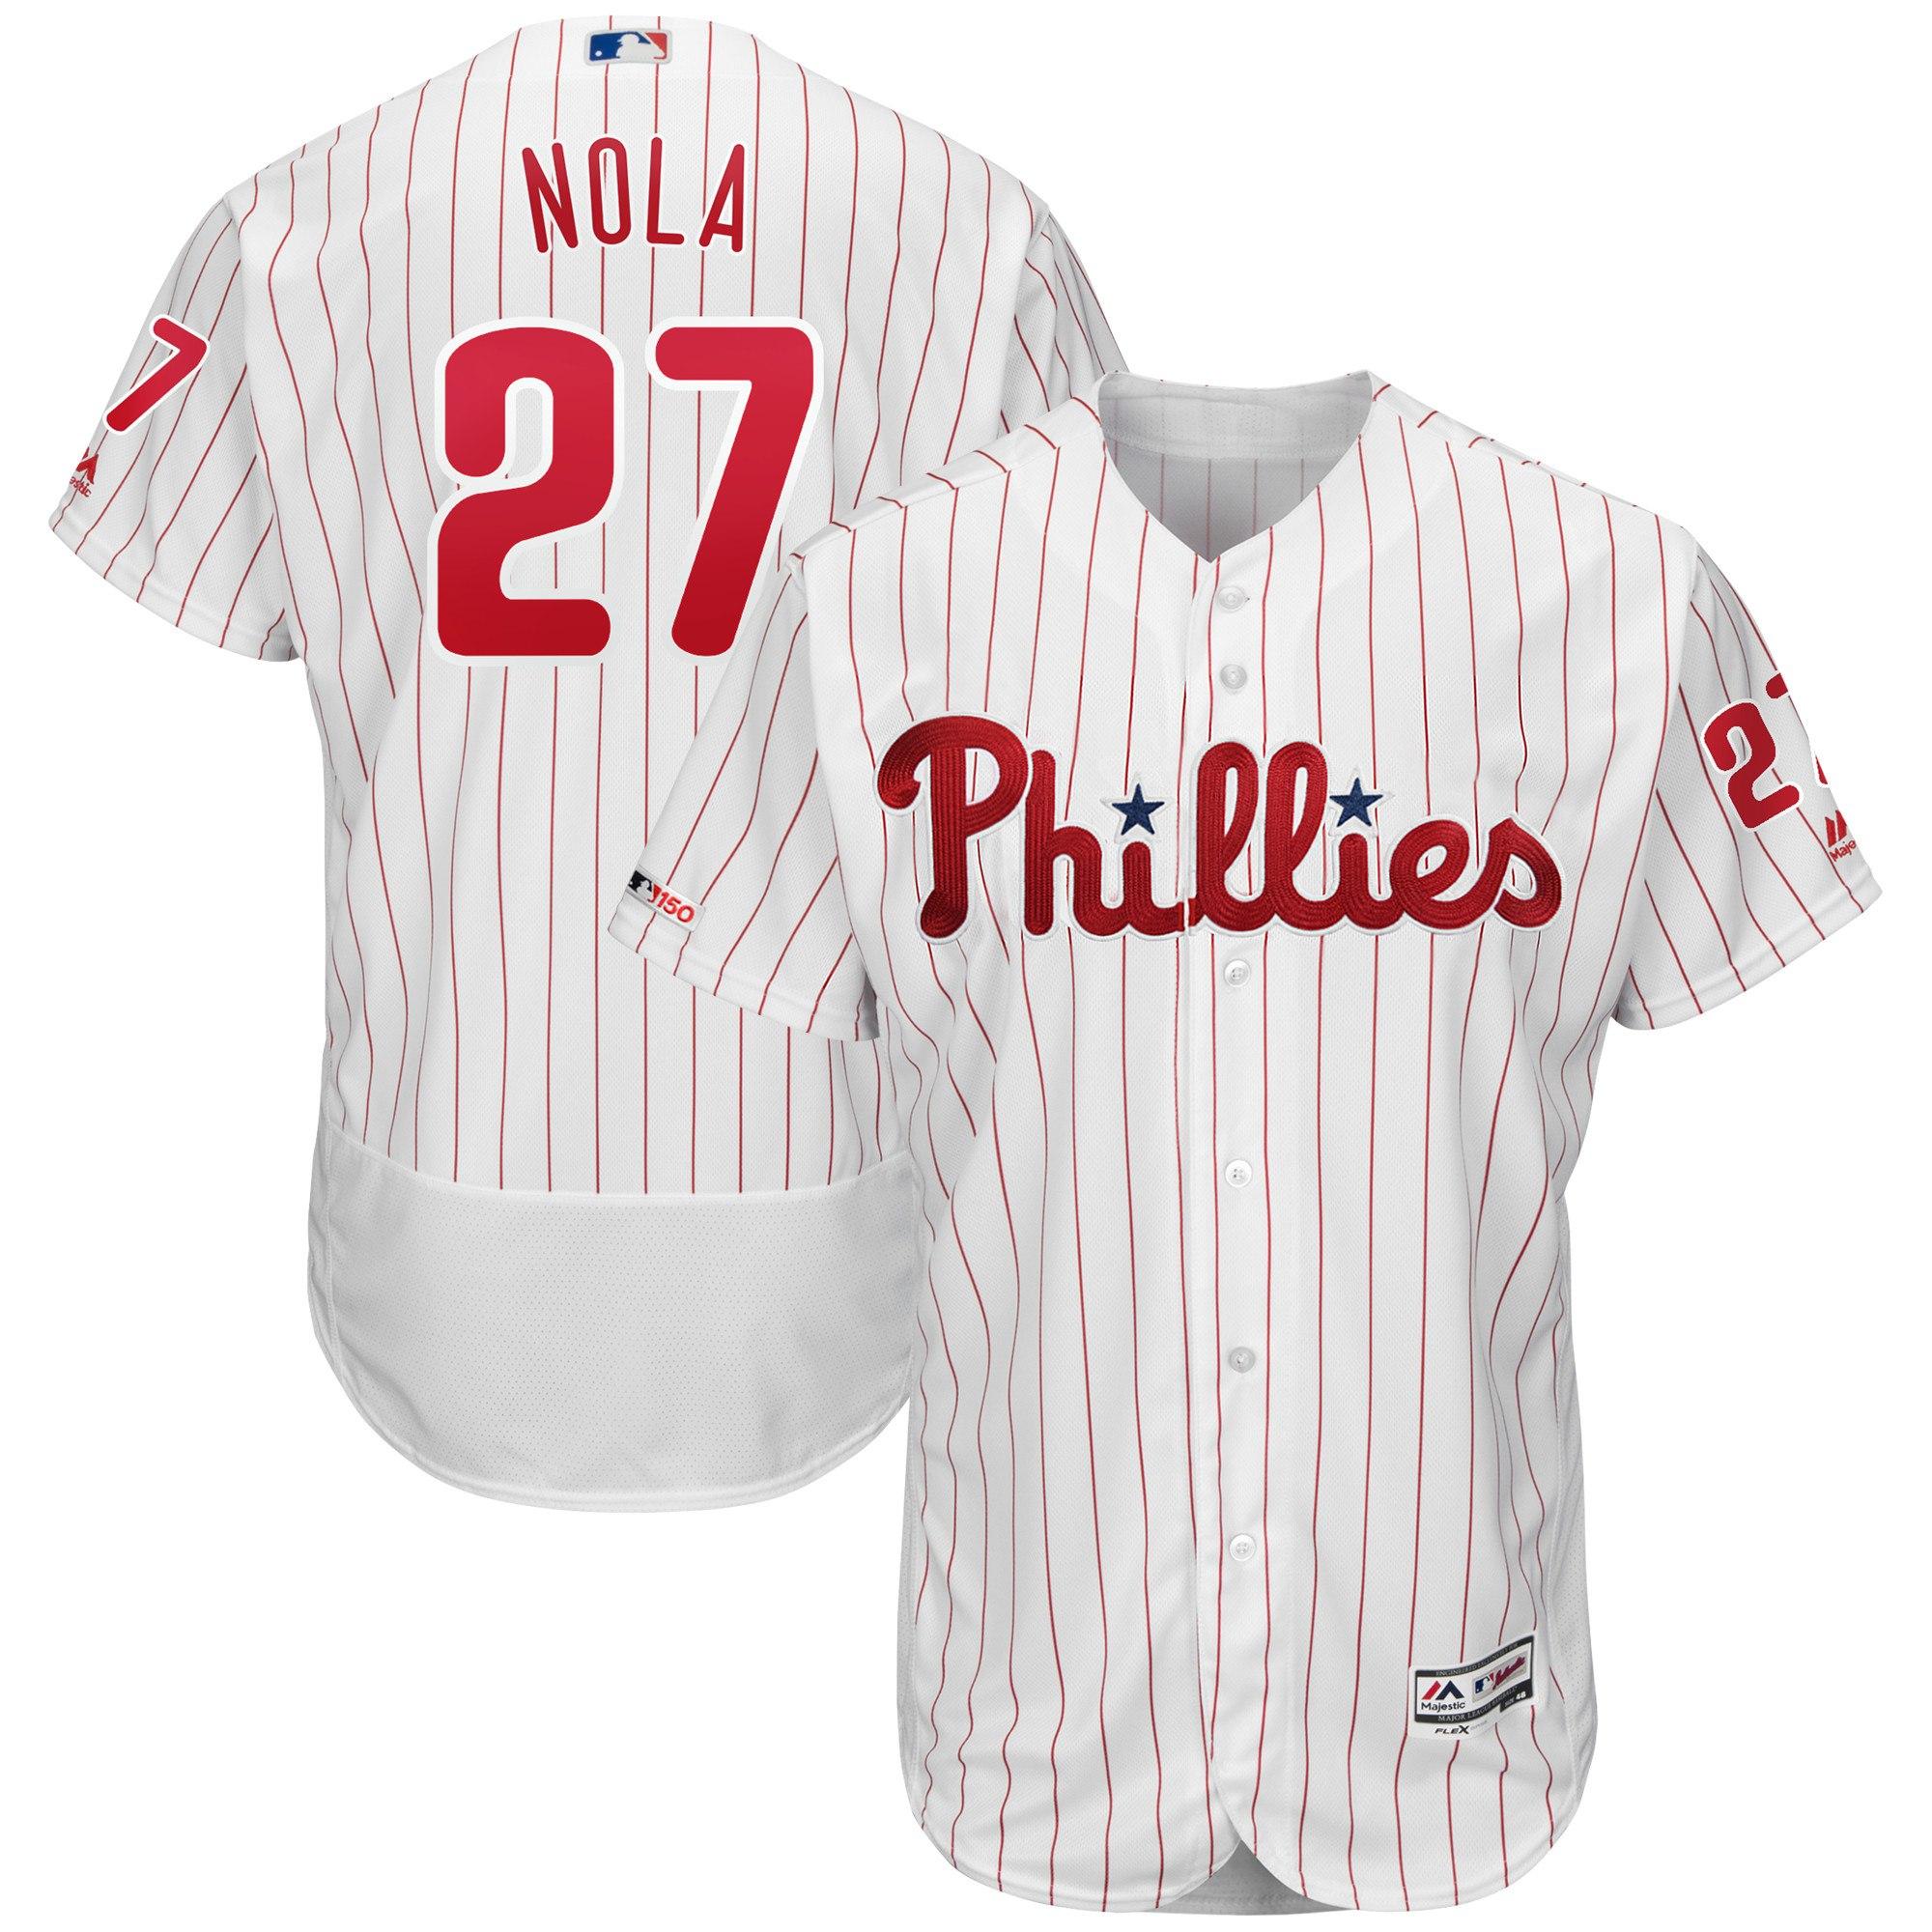 Replica or Authentic Nola Pinstripe Phillies Jersey